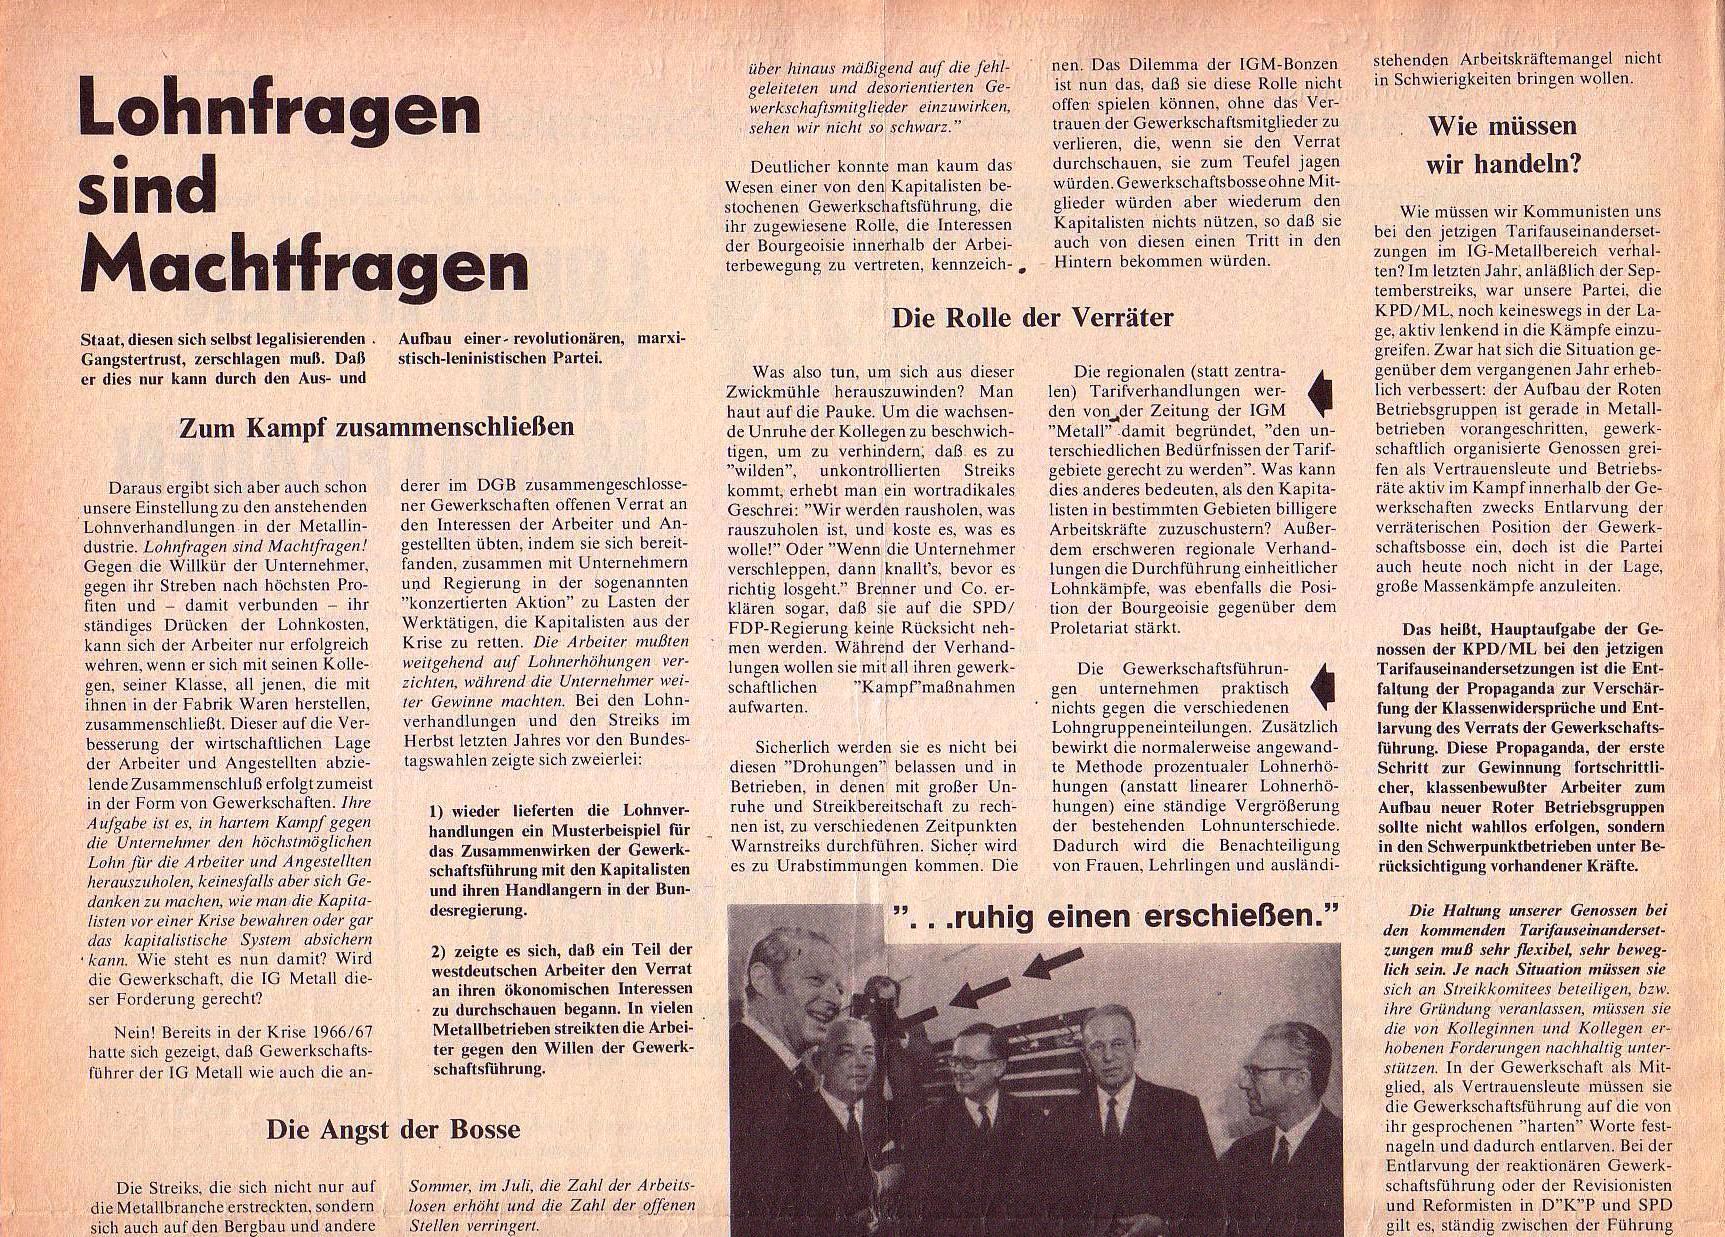 Roter Morgen, 4. Jg., September 1970, Nr. 8, Seite 2a